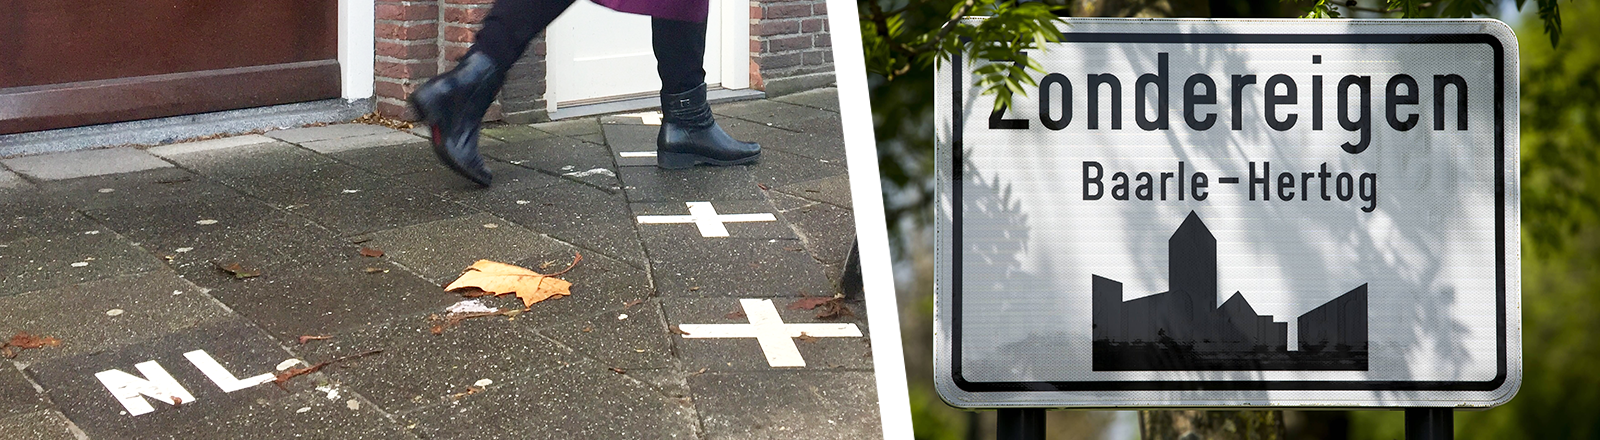 Colalge; Schuhe an Grenzmarkierung, Ortsschild Baarle